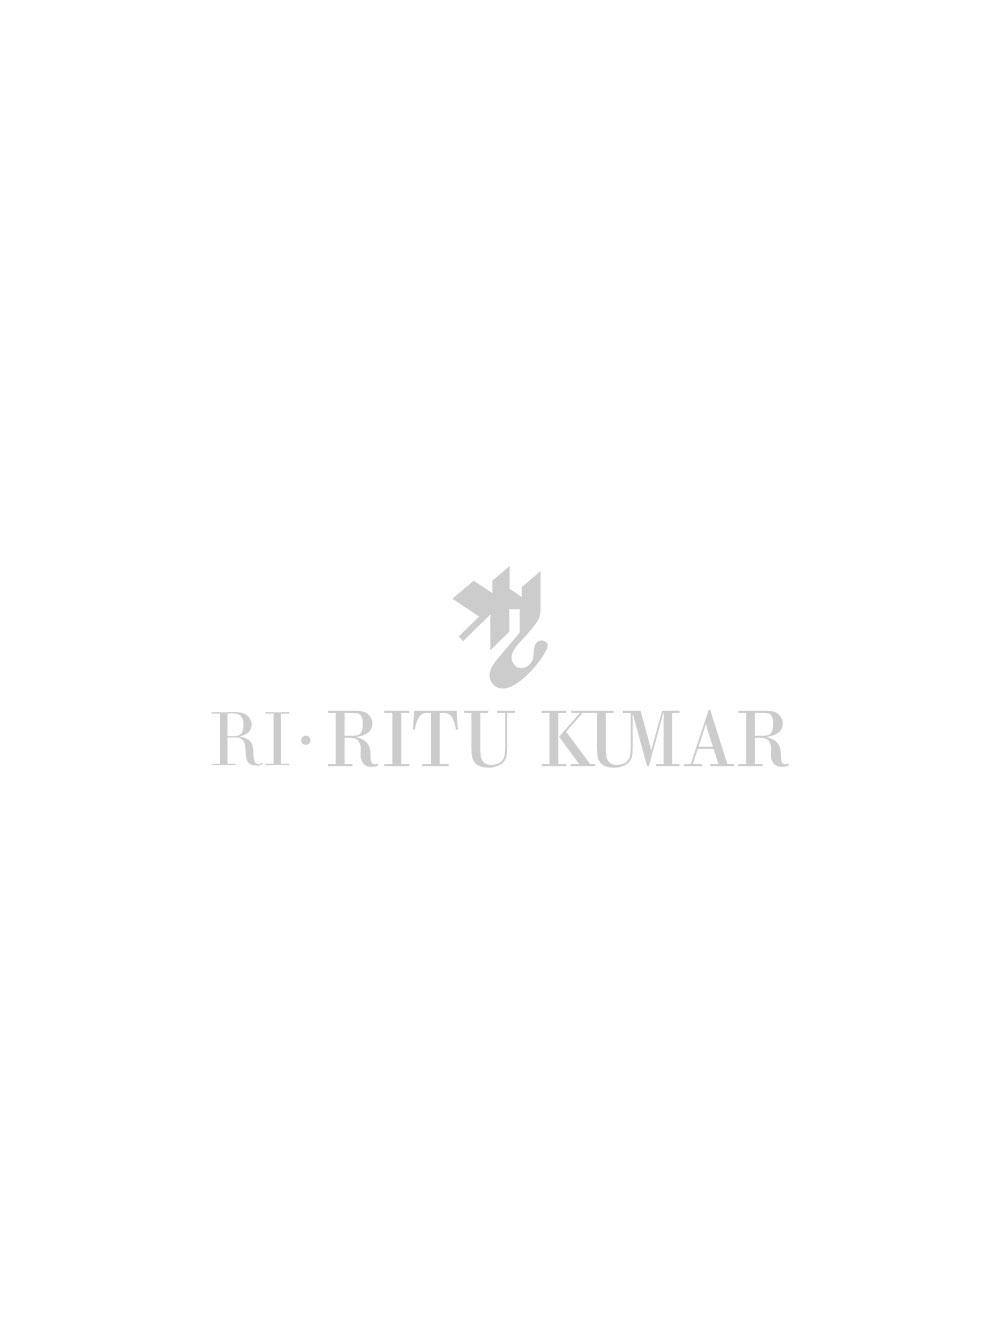 Royal Blue & Turquoise Embroidered Kurta With Dupatta And Churidar